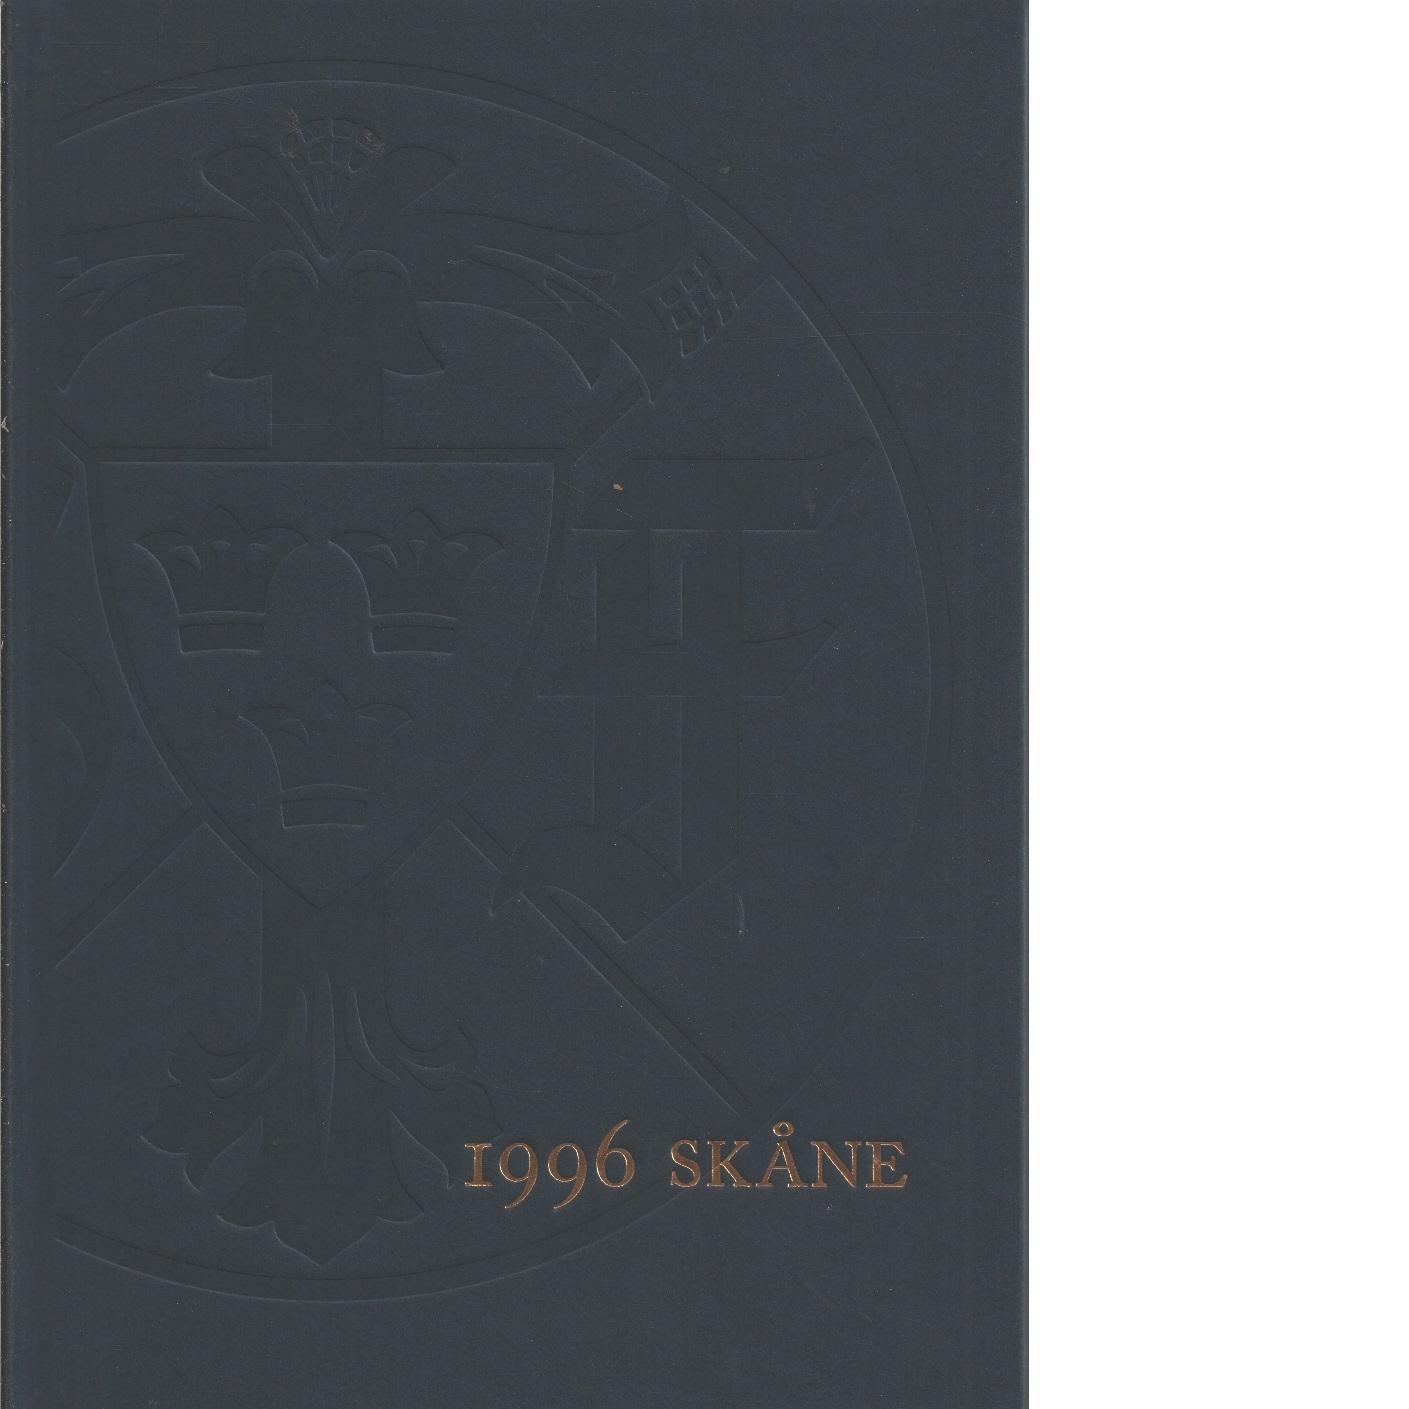 STF:s årsskrift 1996 -Skåne - Red.